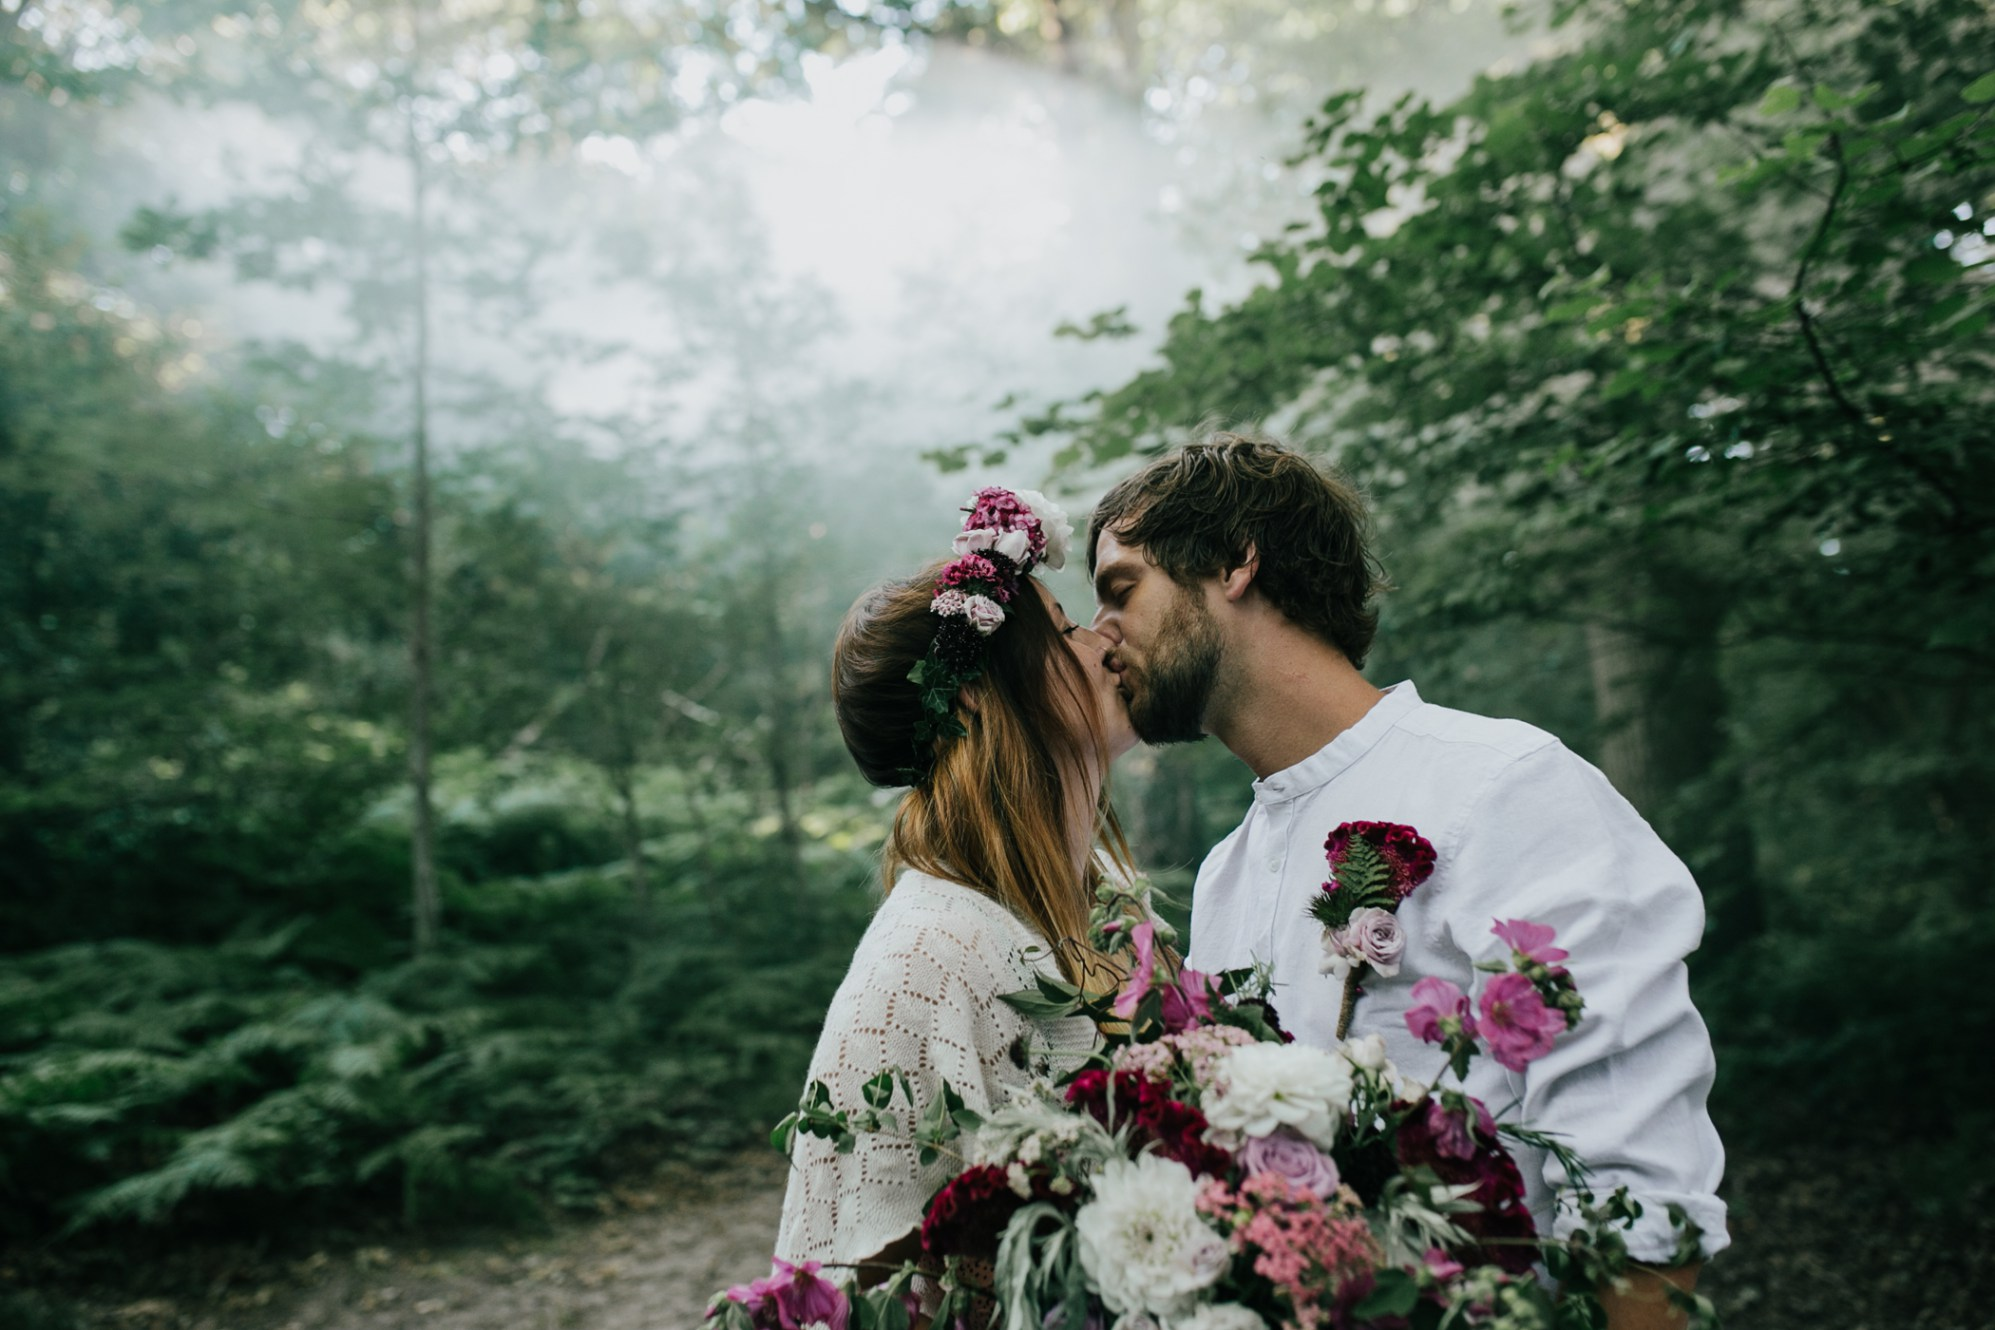 Caroline Goosey - alternative wedding photography - engagement shoot 2